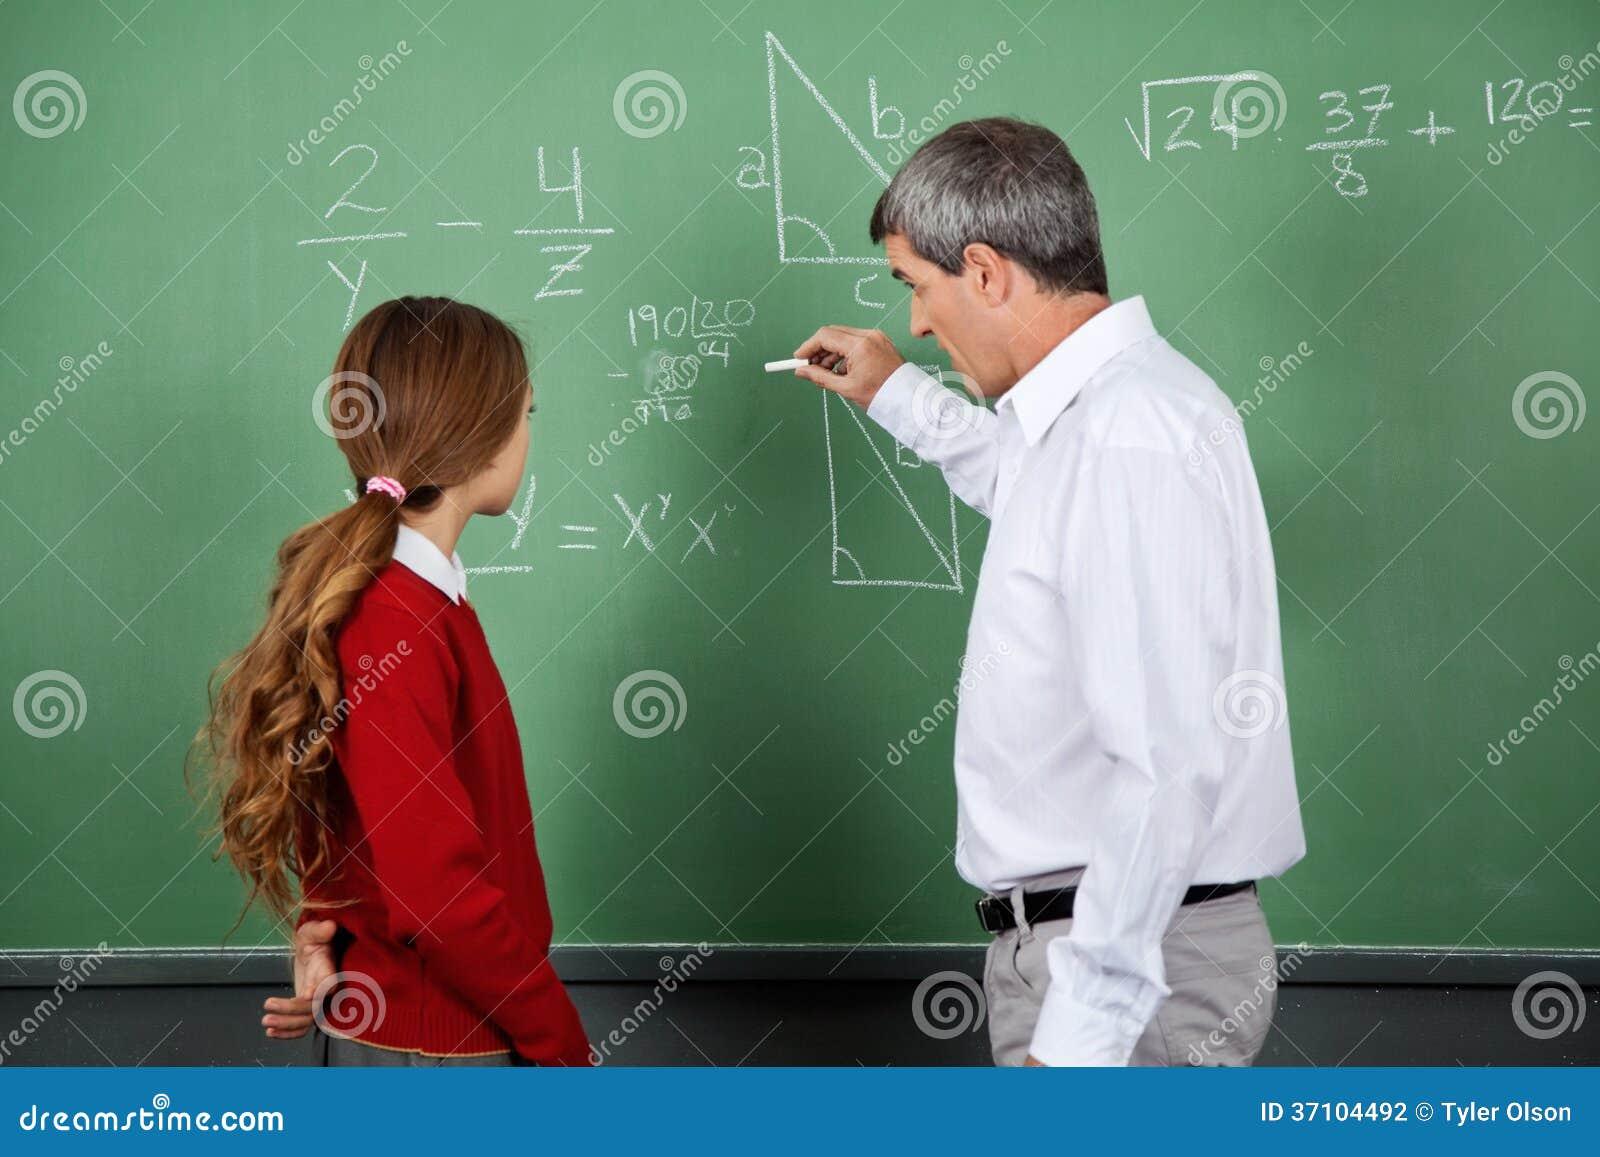 professor teaching mathematics to female student stock